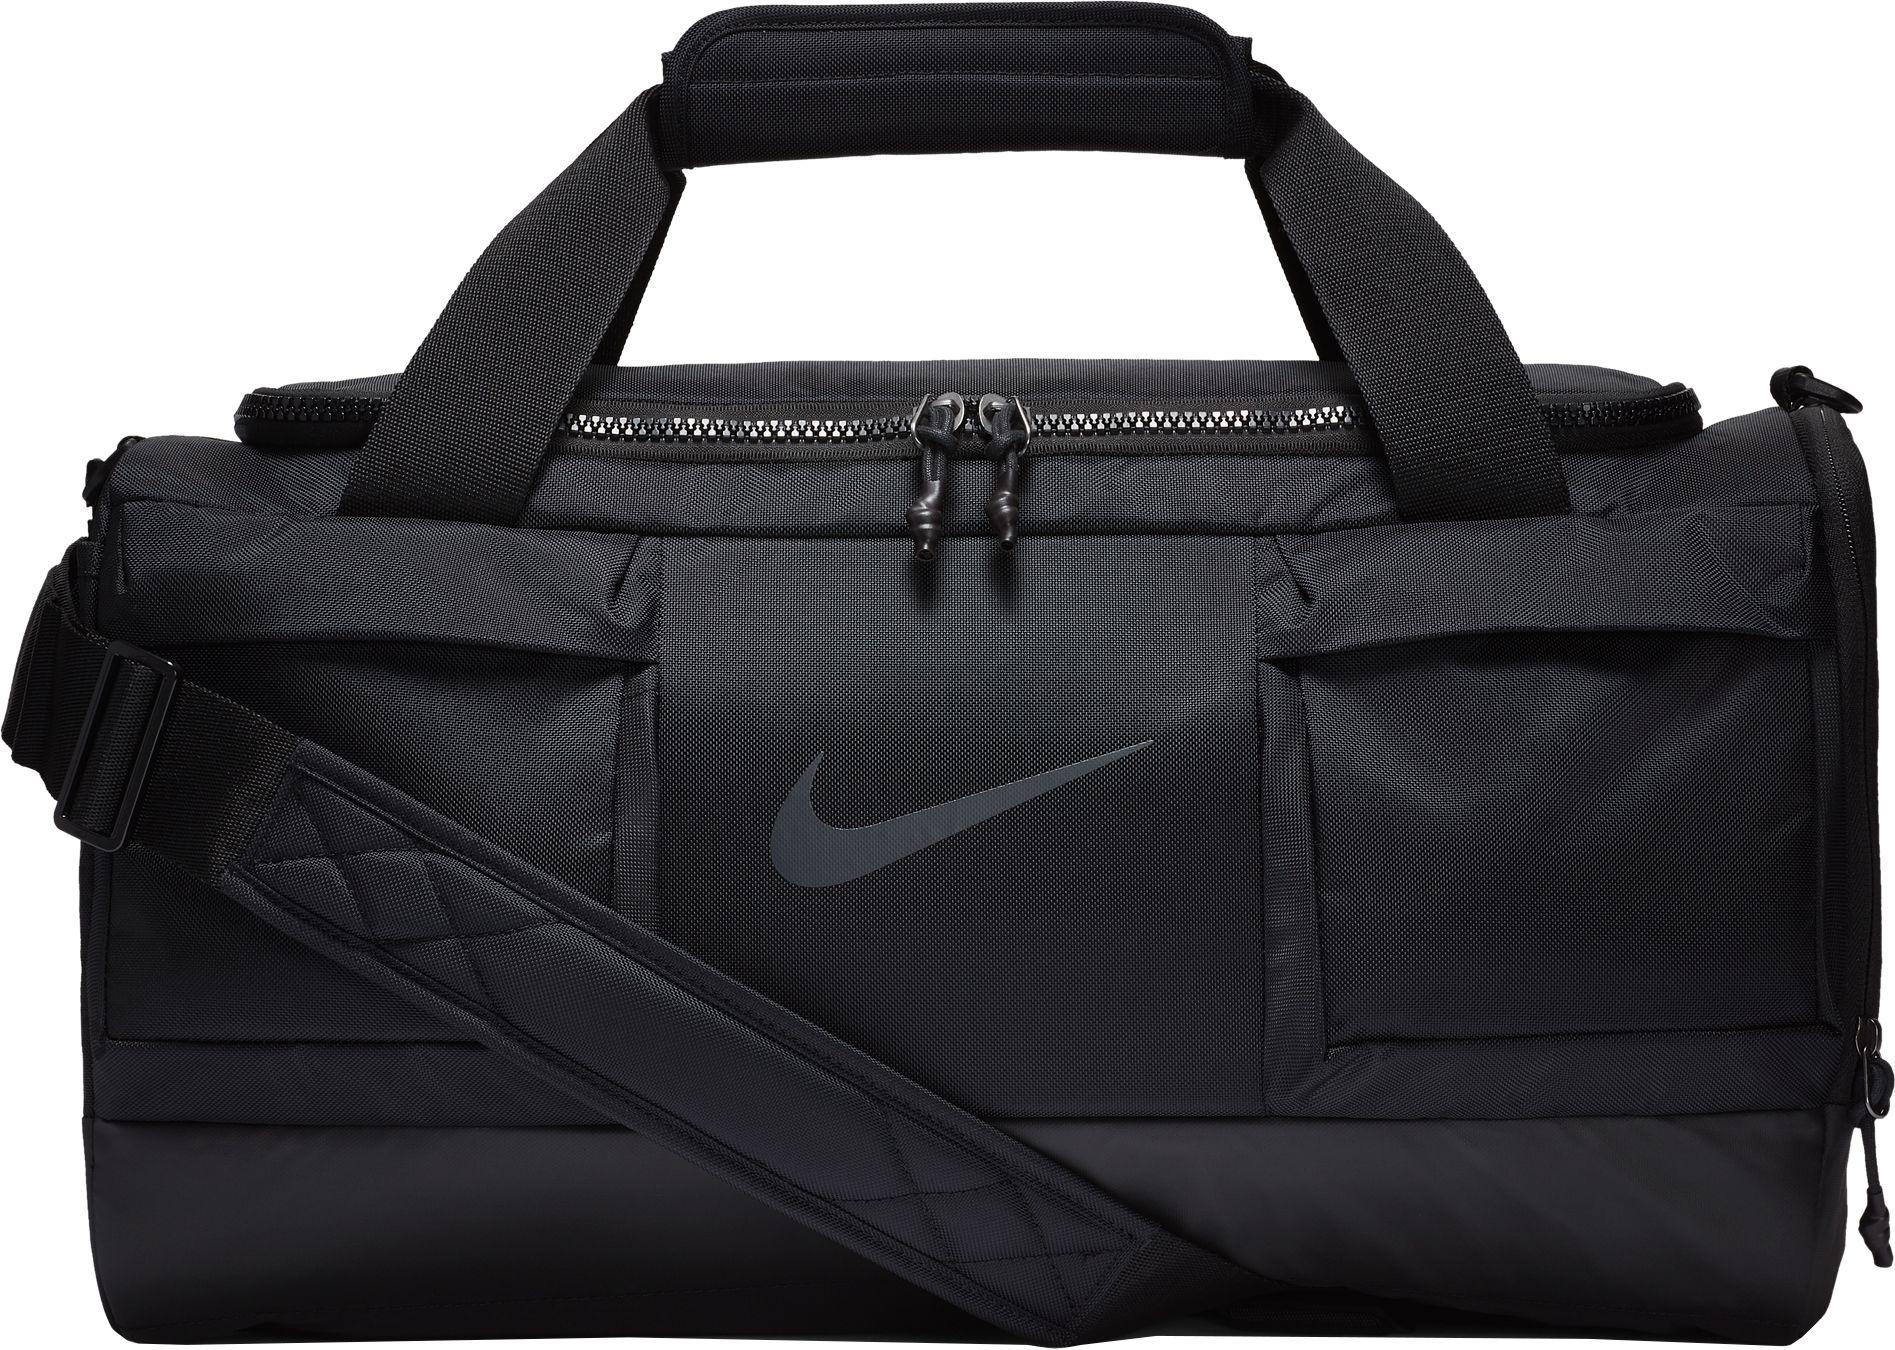 Lyst - Nike Vapor Power Small Training Duffle in Black for Men 38af61f6af